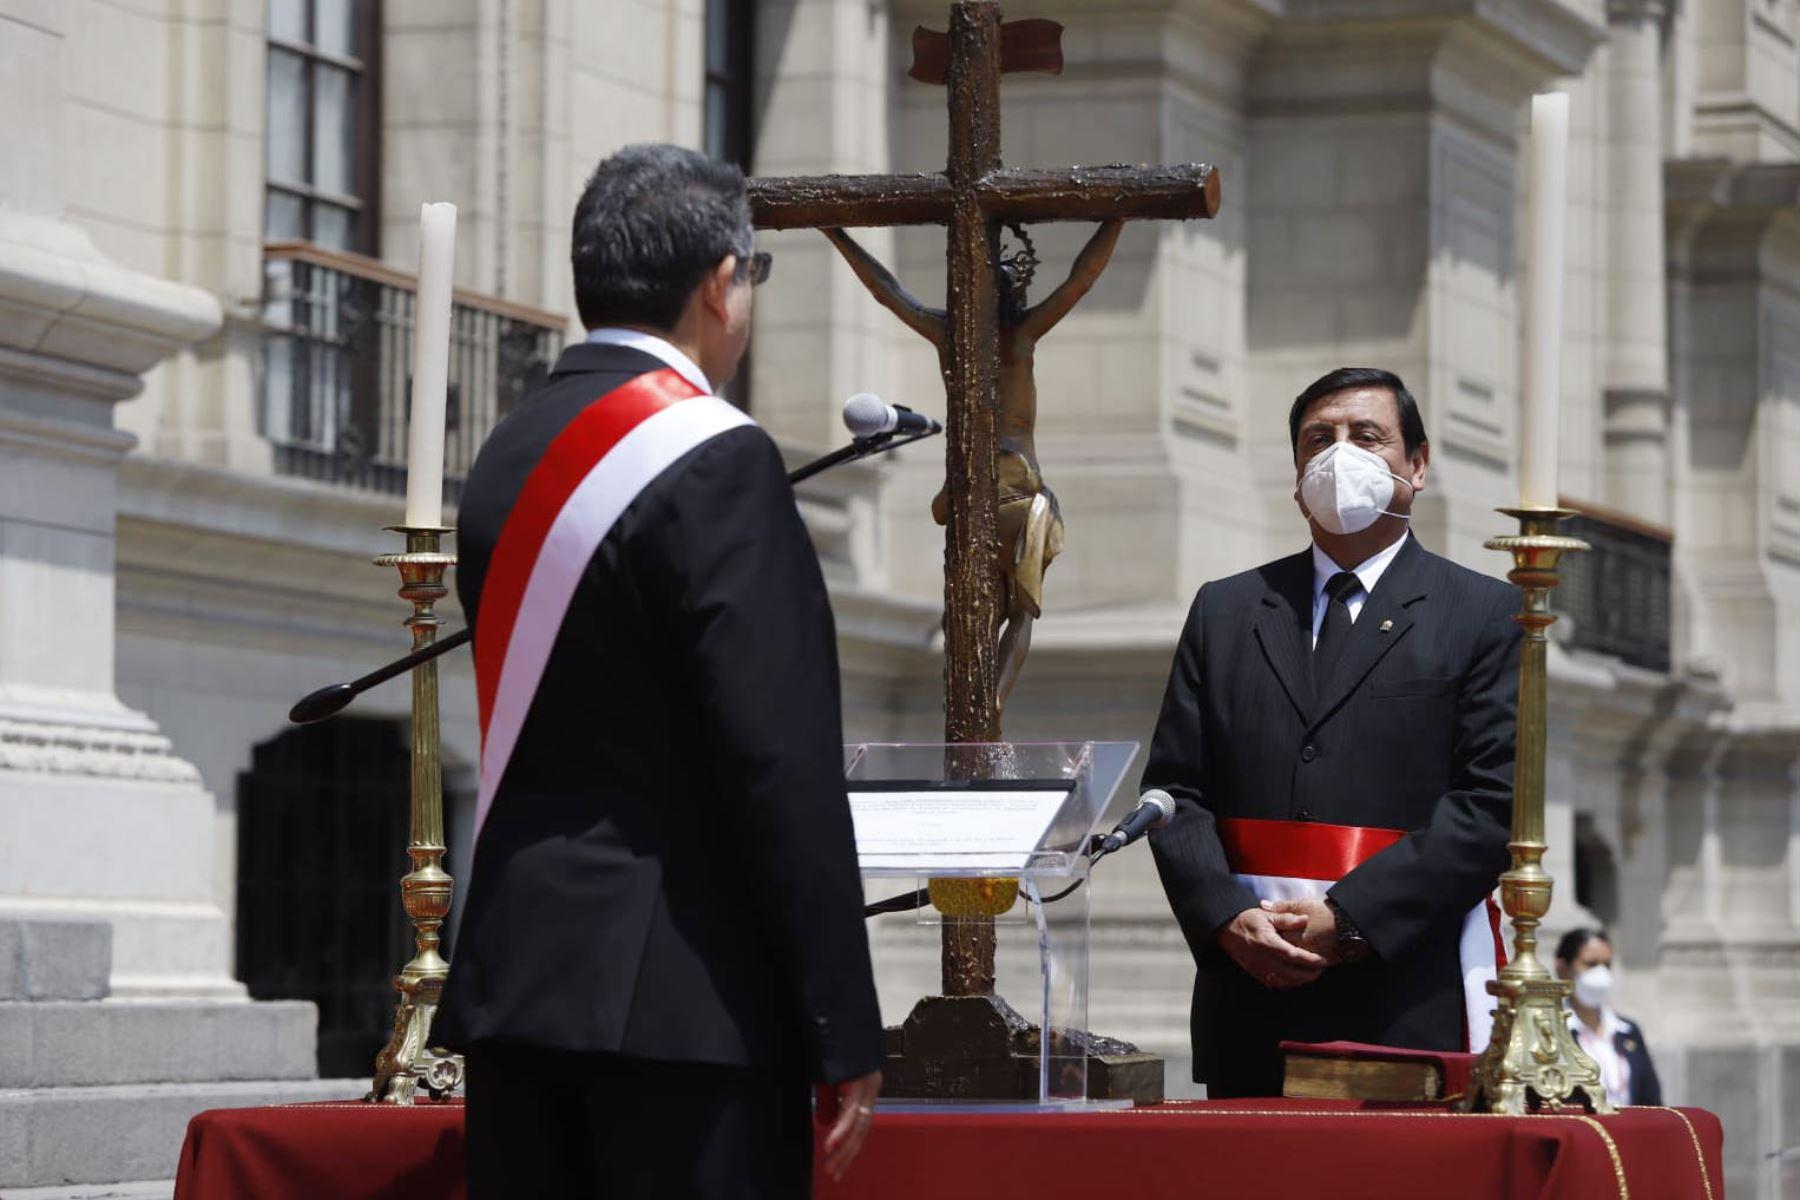 Walter Chávez Cruz jura como ministro de Defensa | Noticias | Agencia  Peruana de Noticias Andina